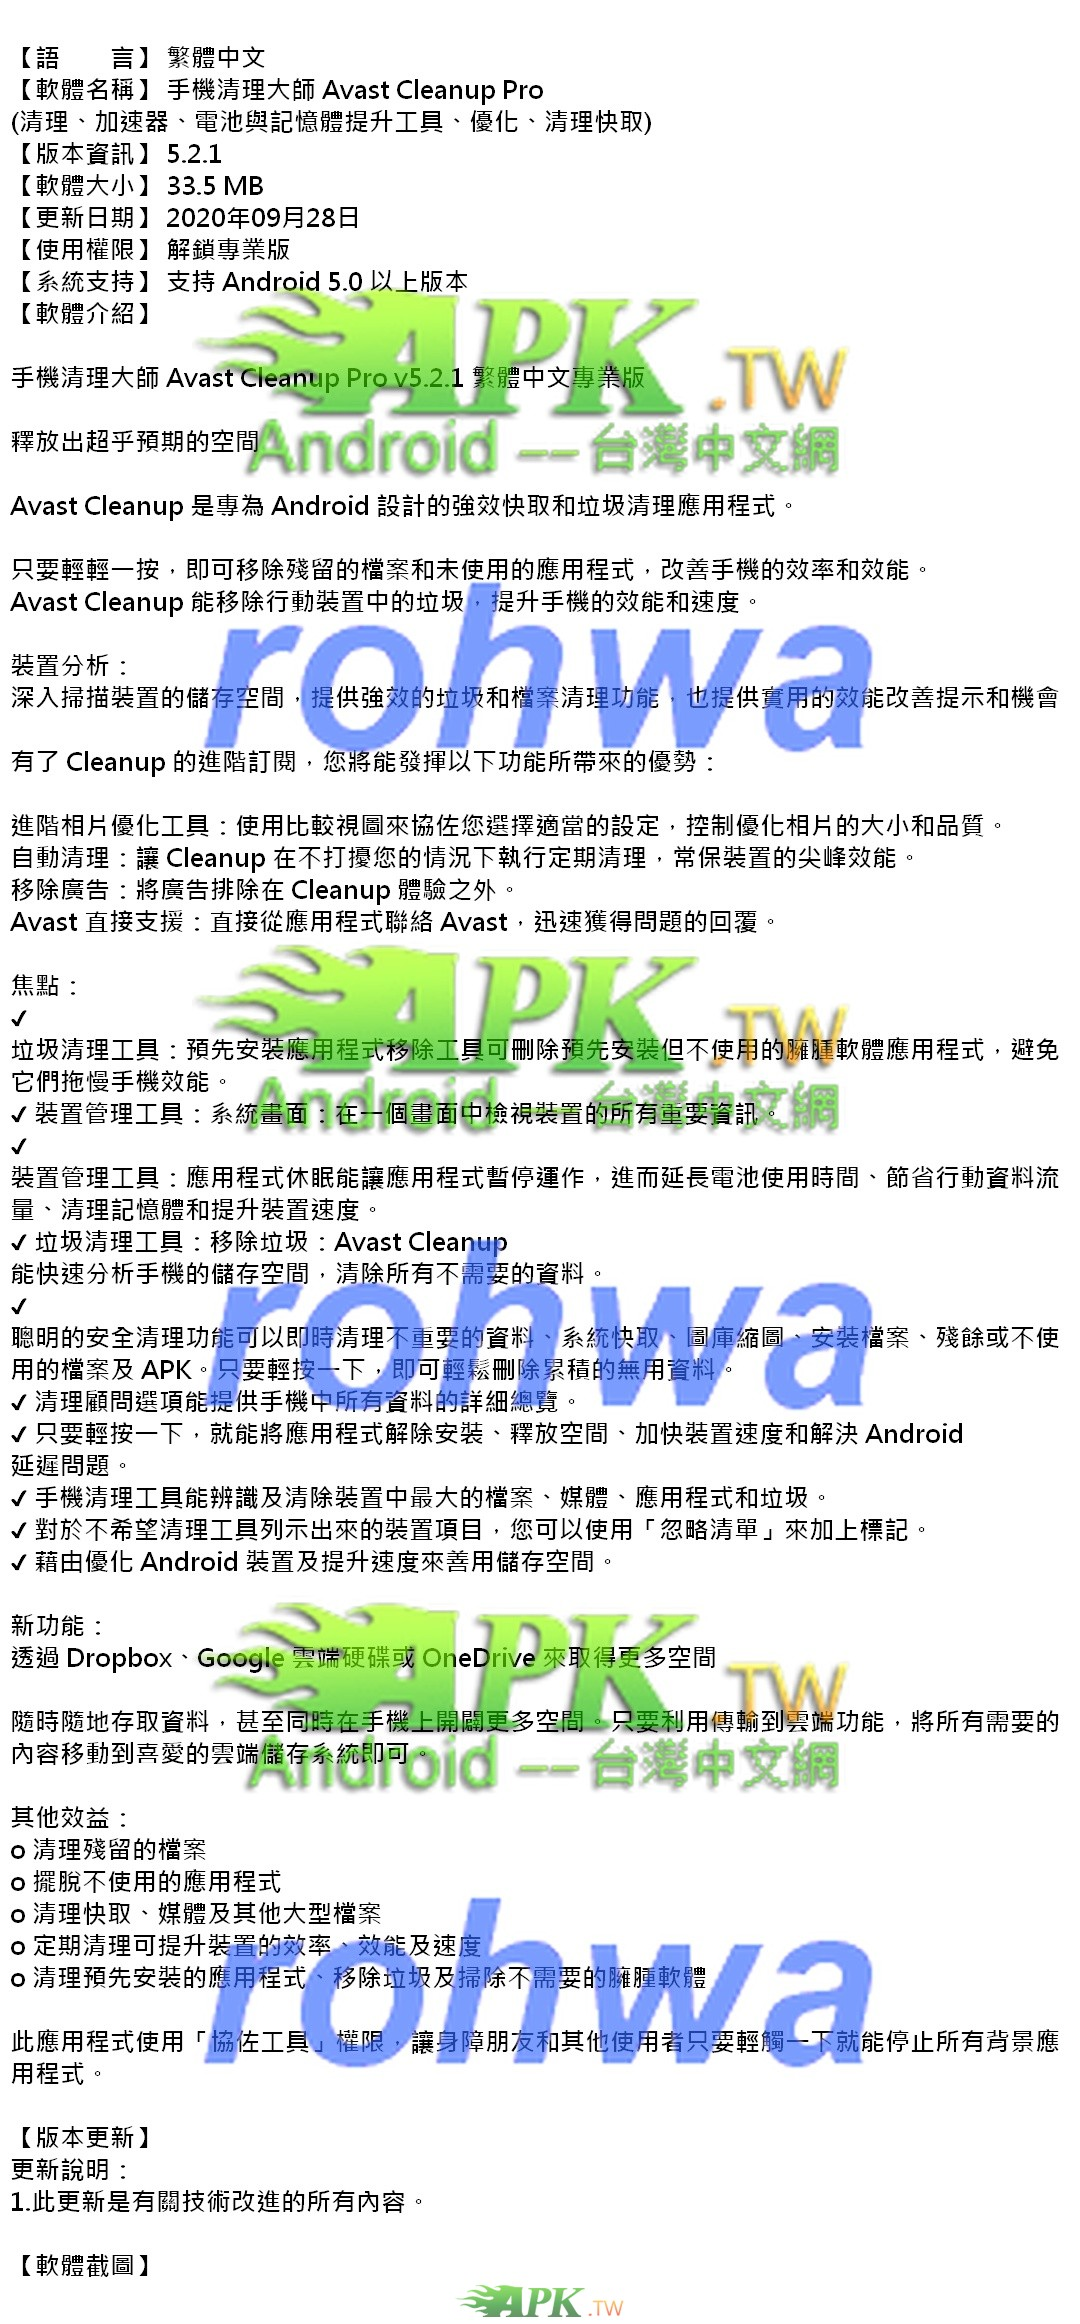 Avast_Cleanup_Pro_5.2.1_.jpg